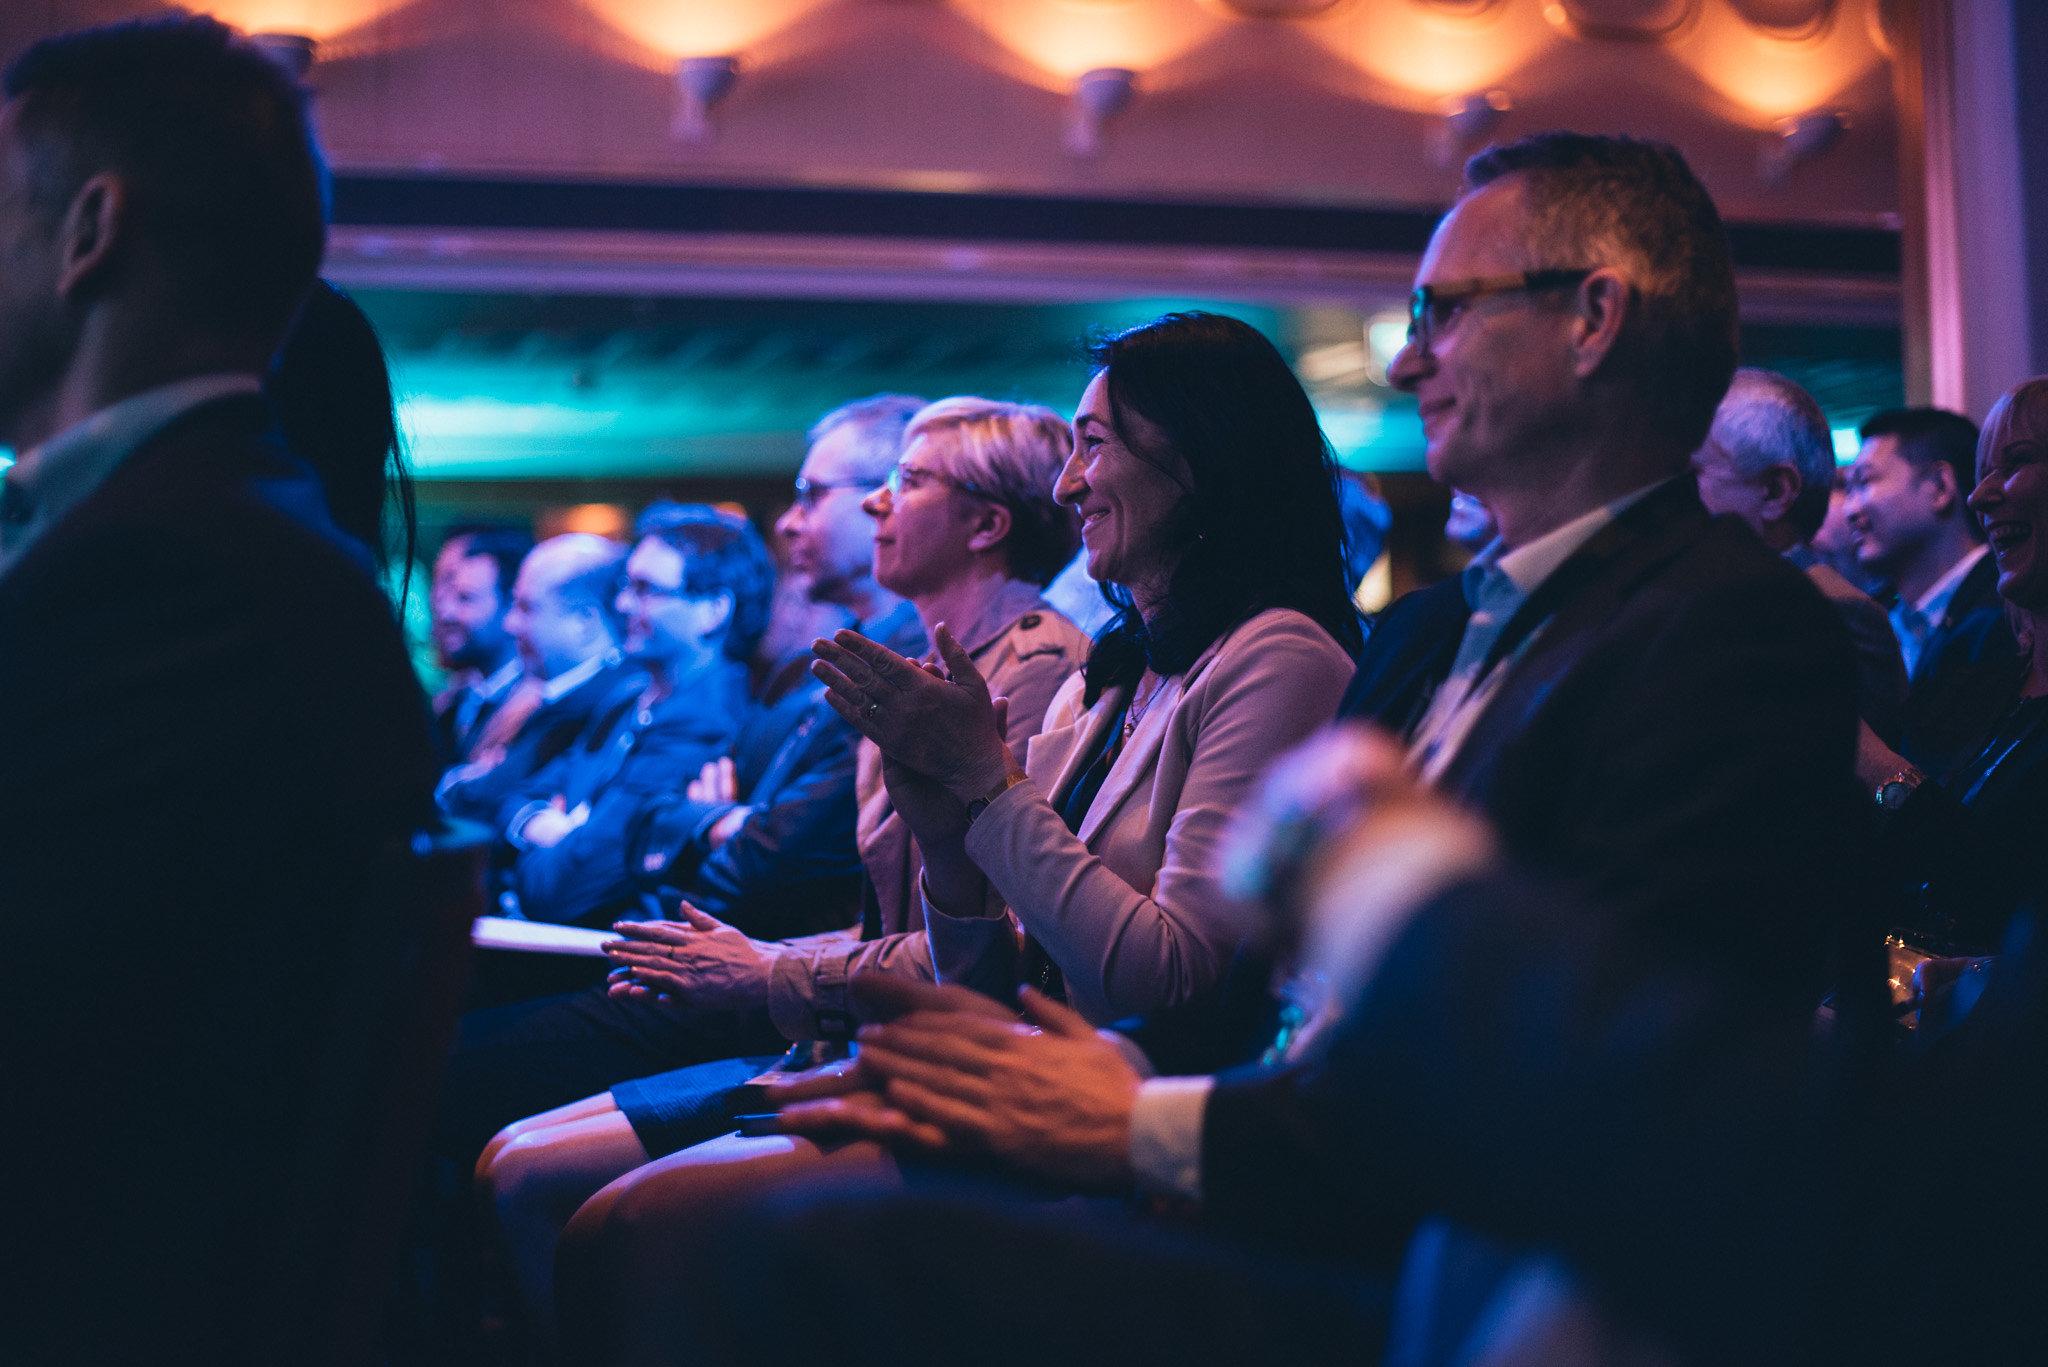 3DX_forum_event_highlights_rotterdam_presentations-30.jpg